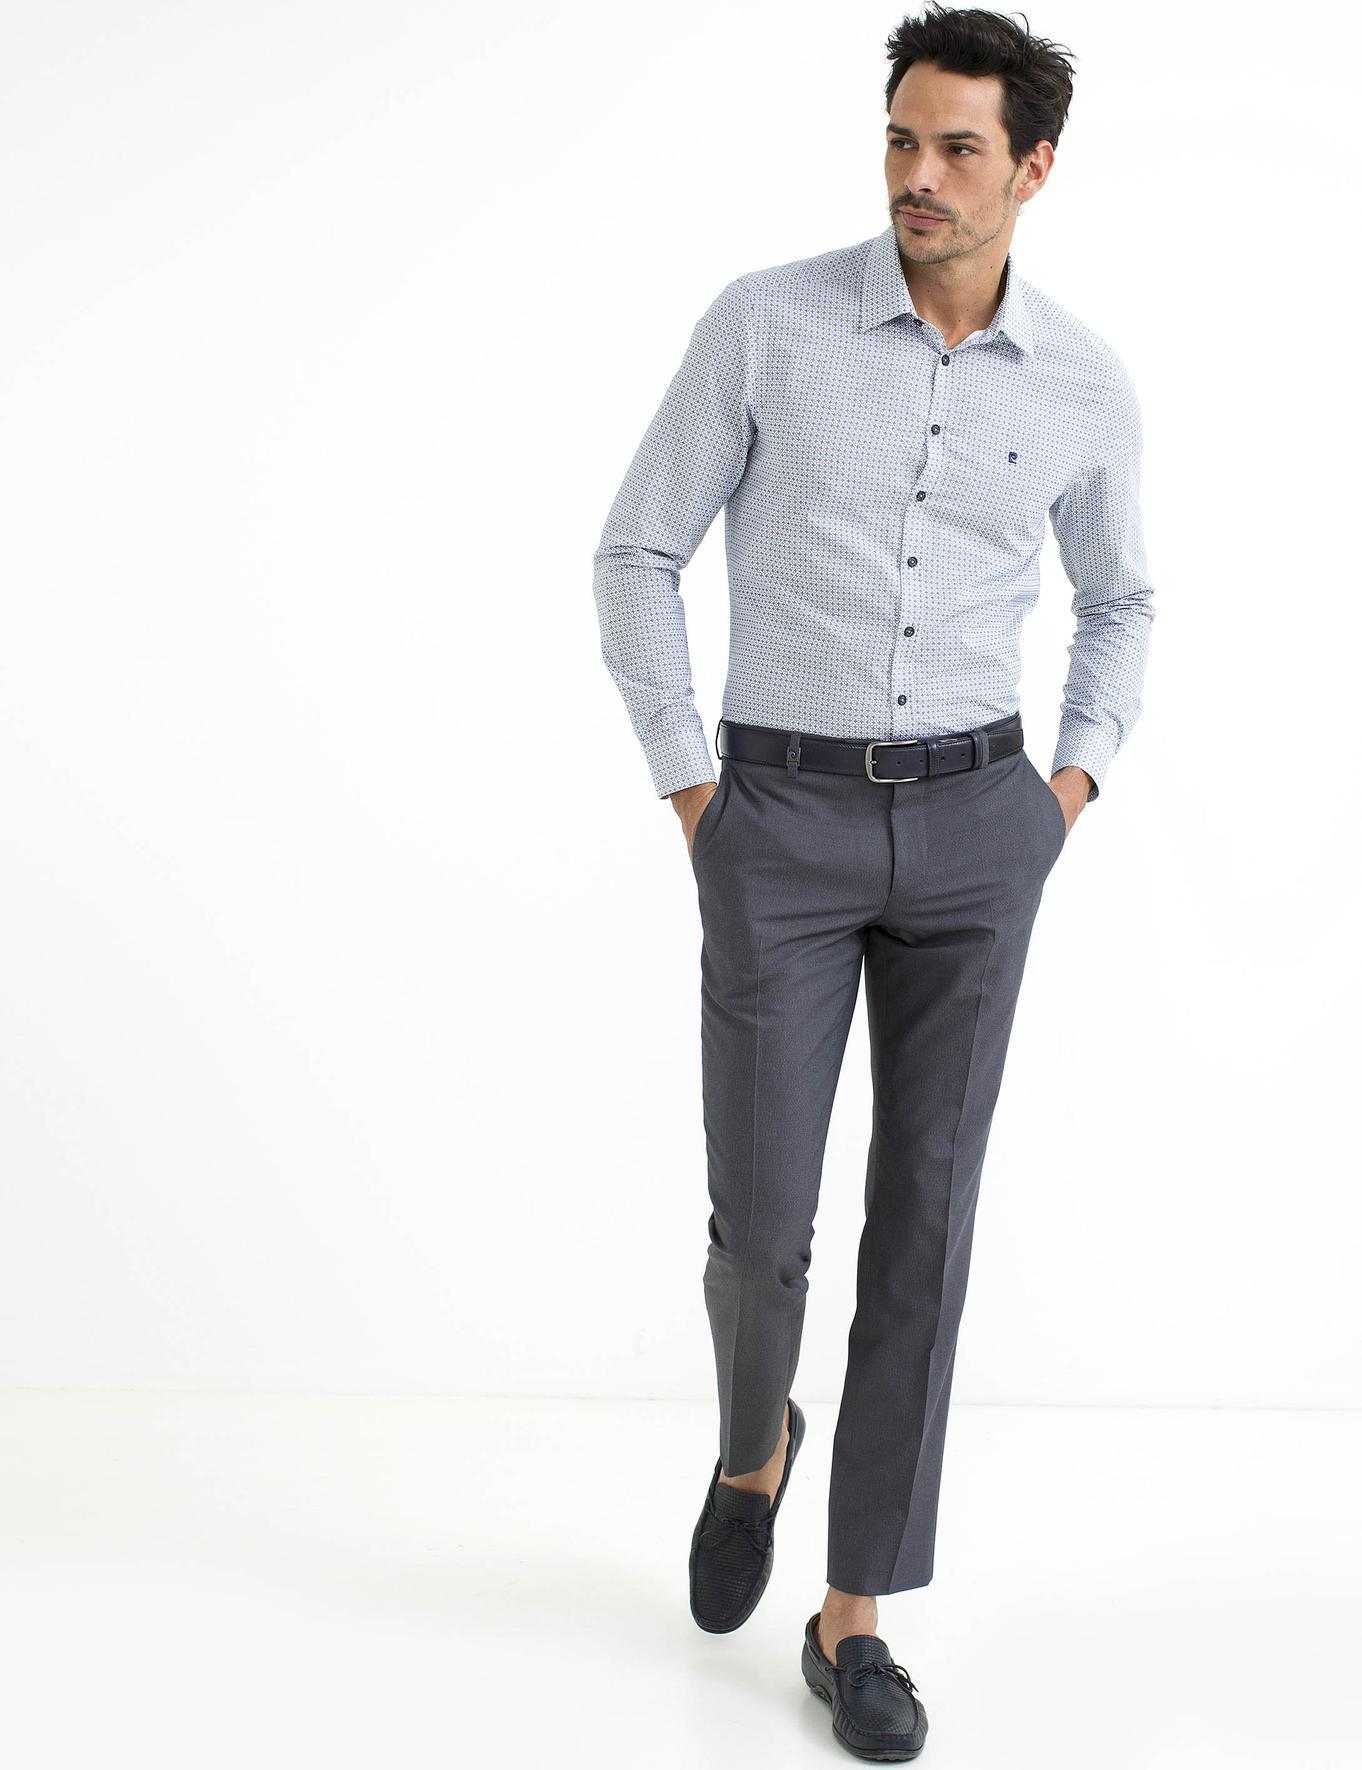 Siyah Detaylı Slim Fit Gömlek